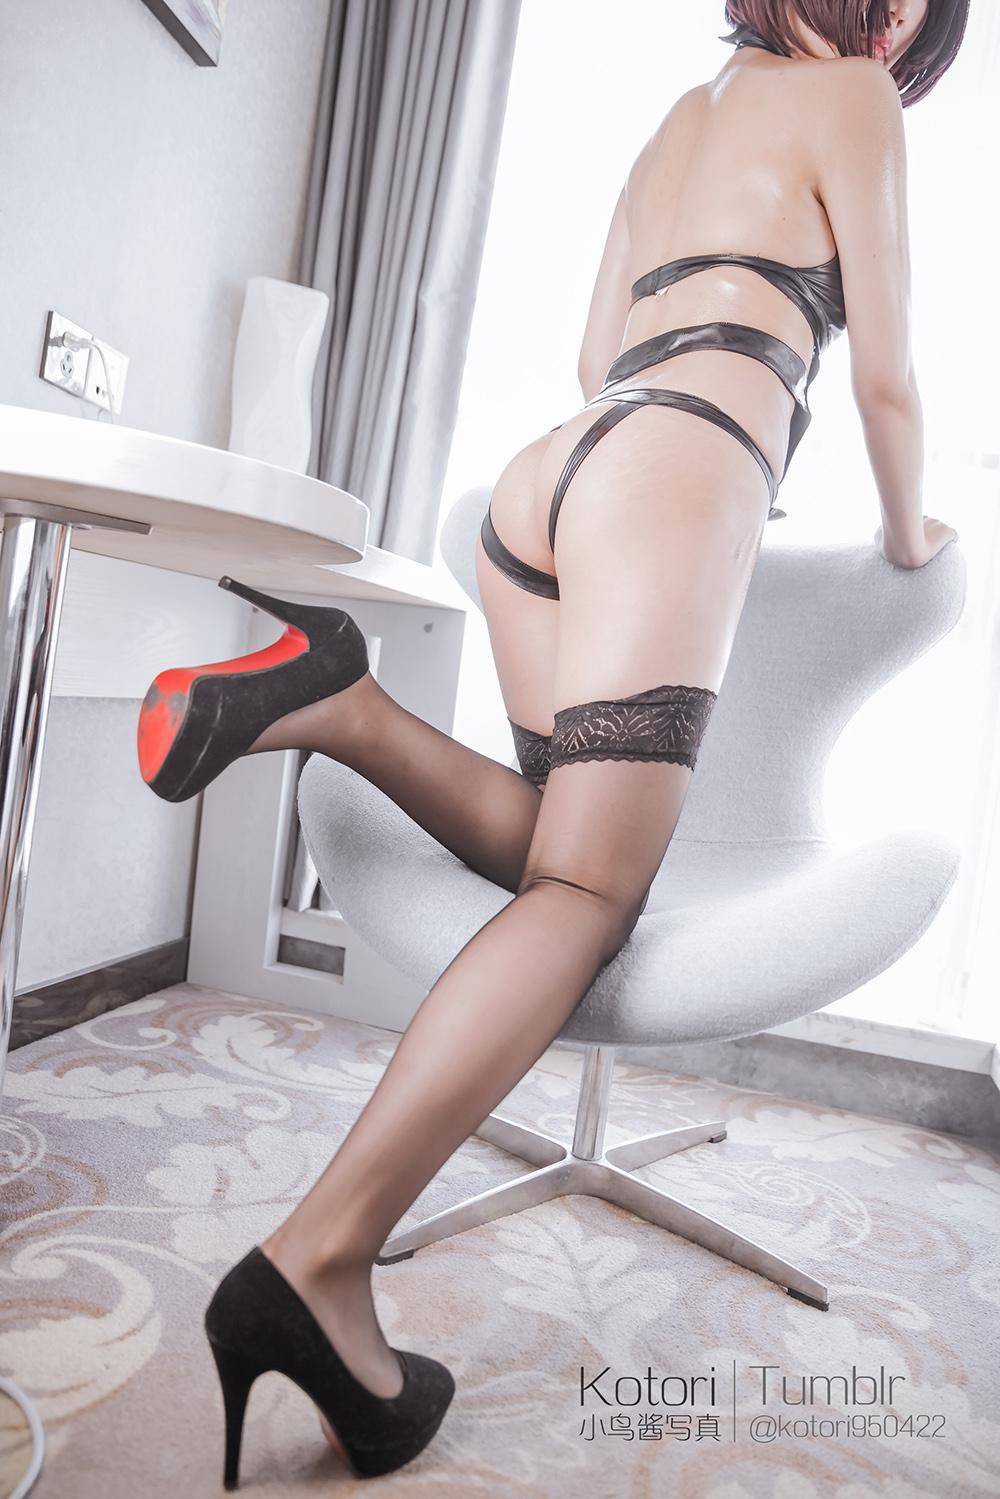 dqKfgQ - Cosplay girl PR社 福利姬 小鸟酱系列–黑色束缚衣